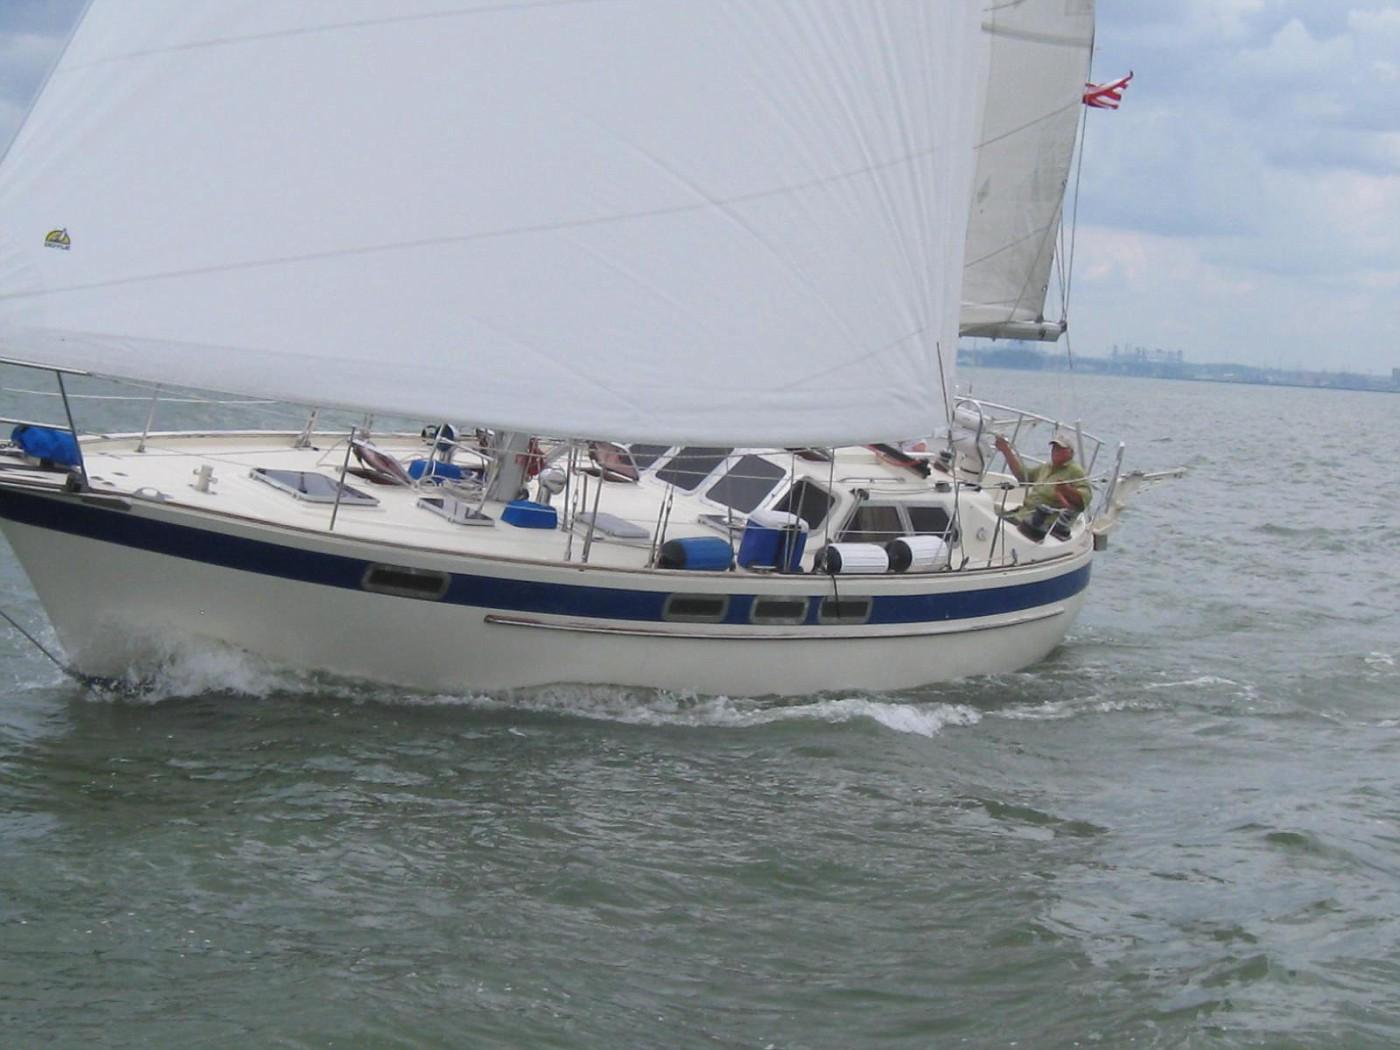 145 - Luff Shack - sailing